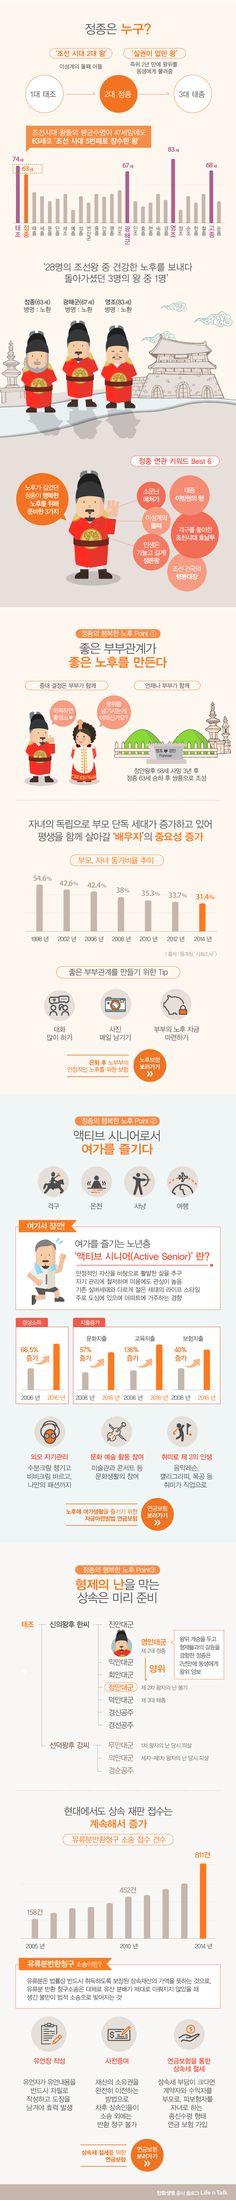 [infographic] '조선시대 5번째로 장수한 왕 정종, 그의 건강한 노후 비결'에 대한 인포그래픽